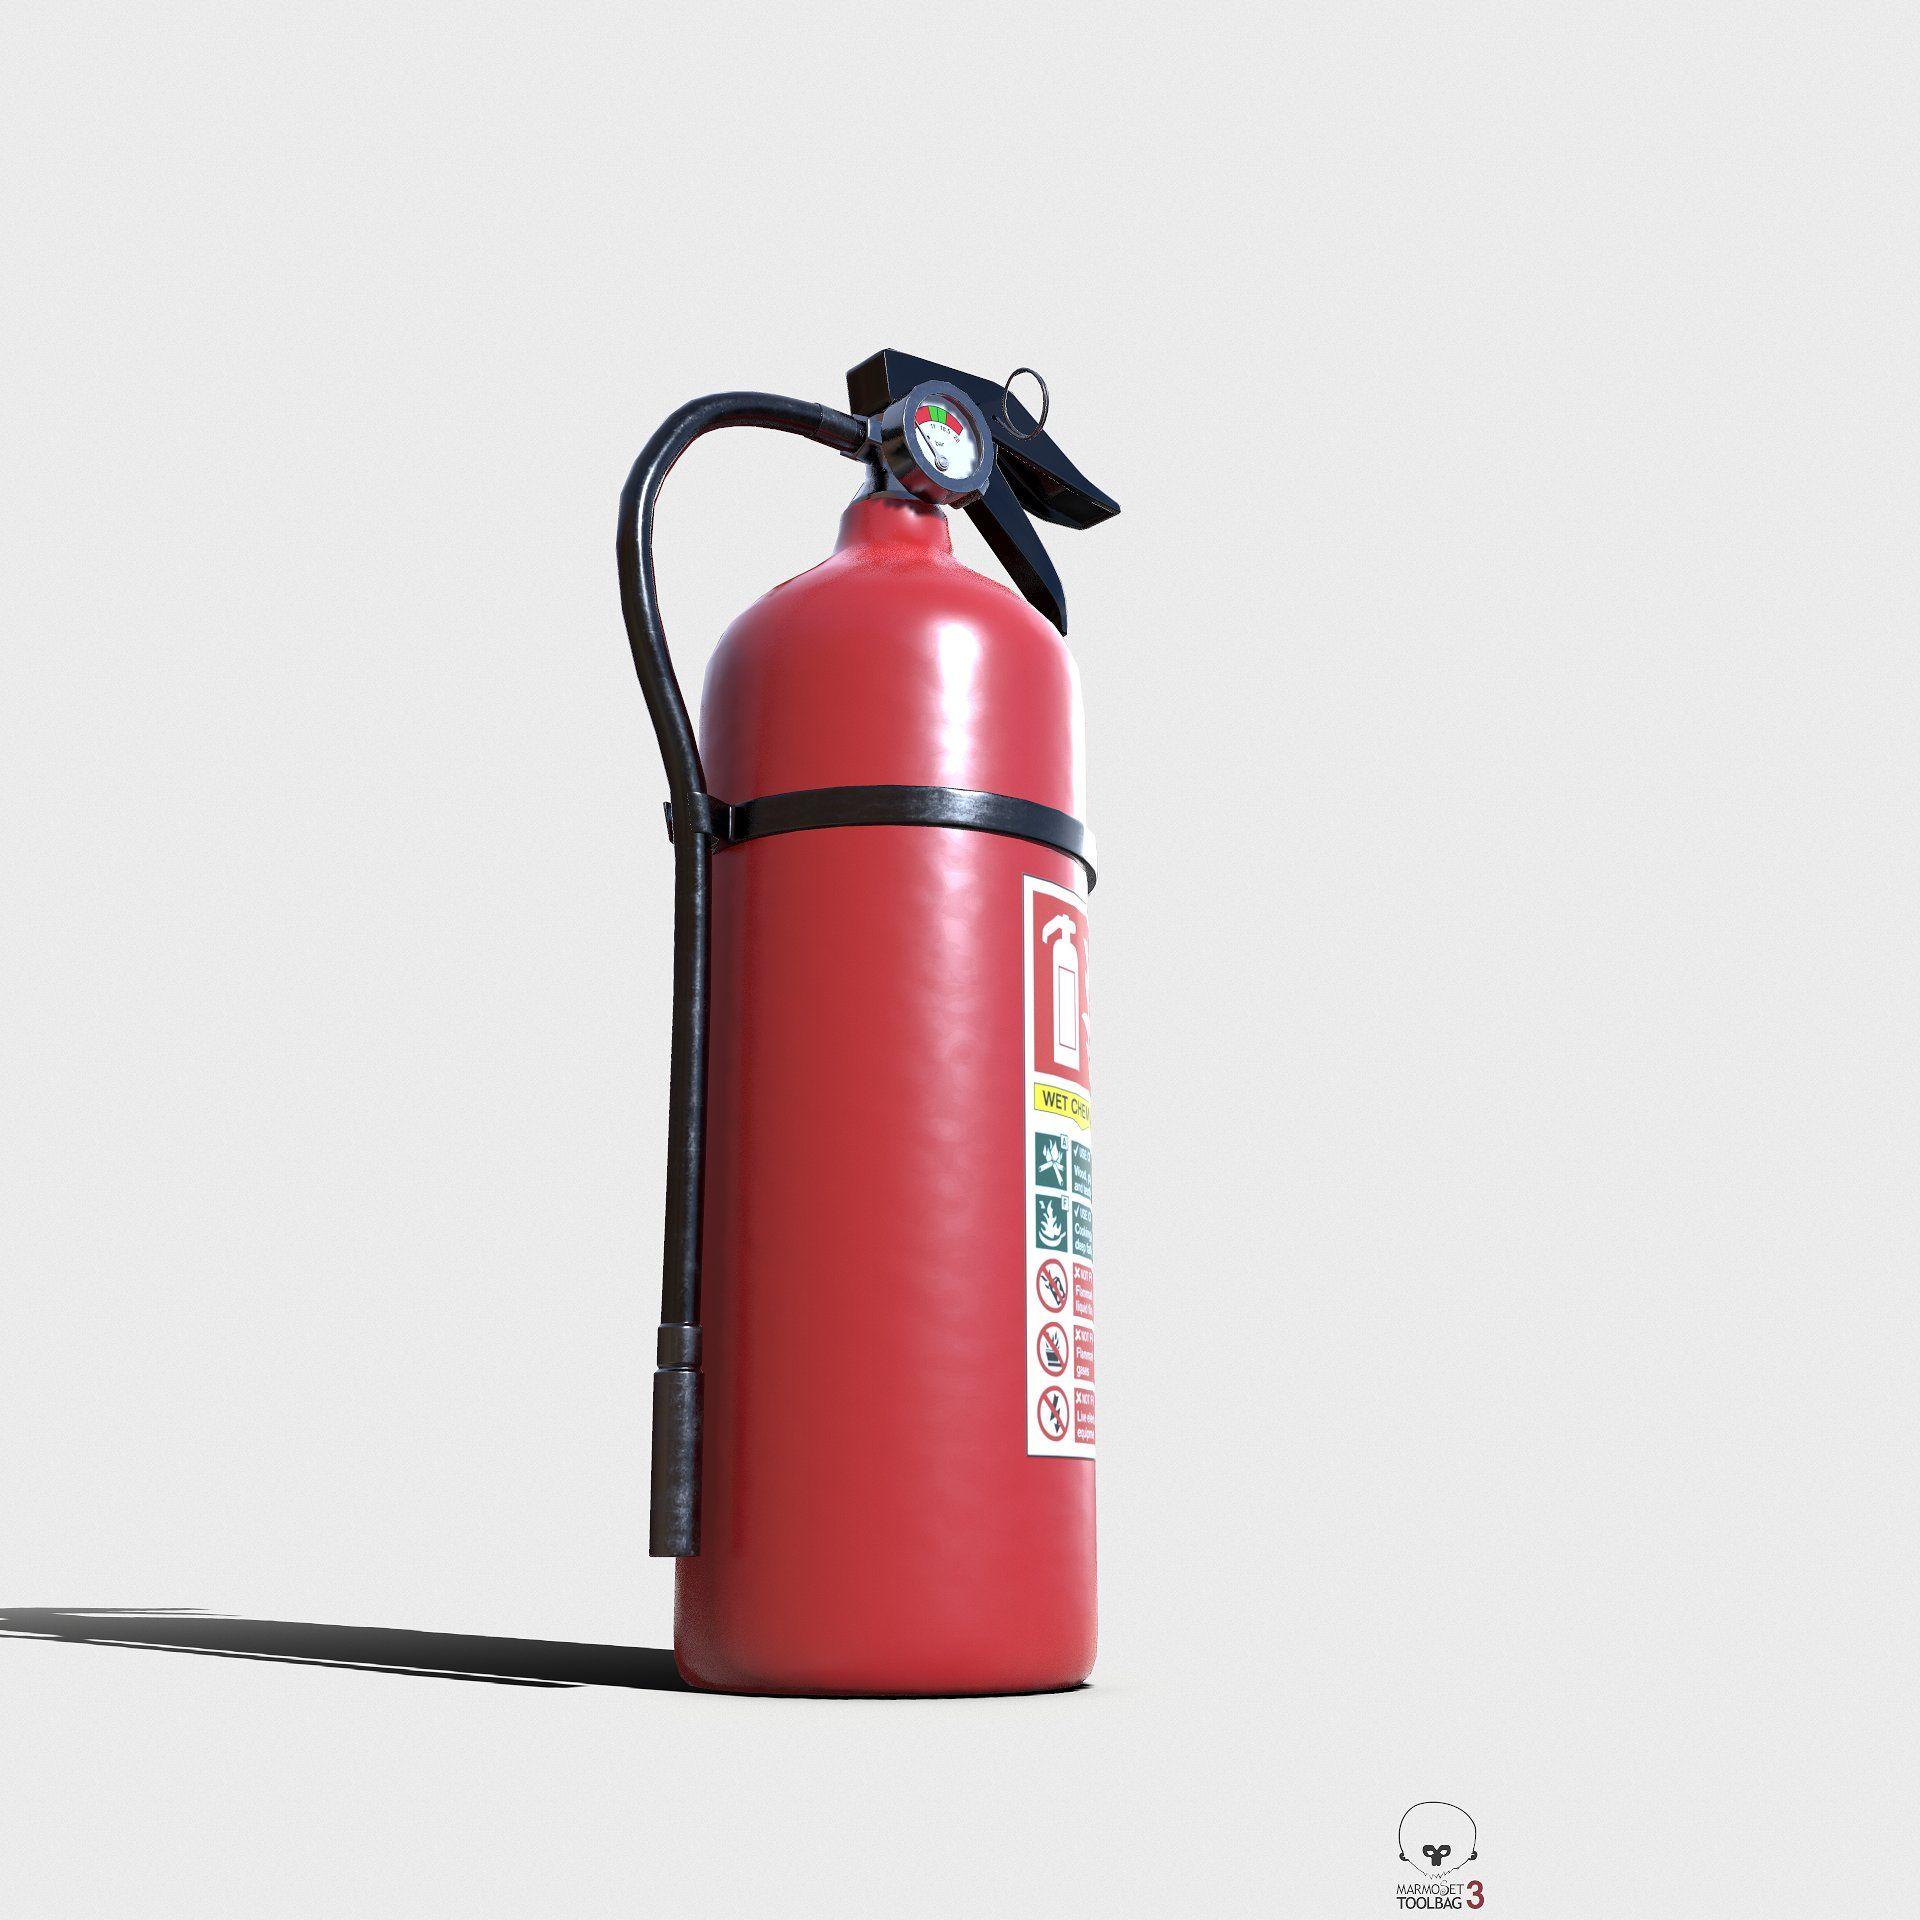 fire-extinguisher-vibrator-joke-photo-french-woman-orgasm